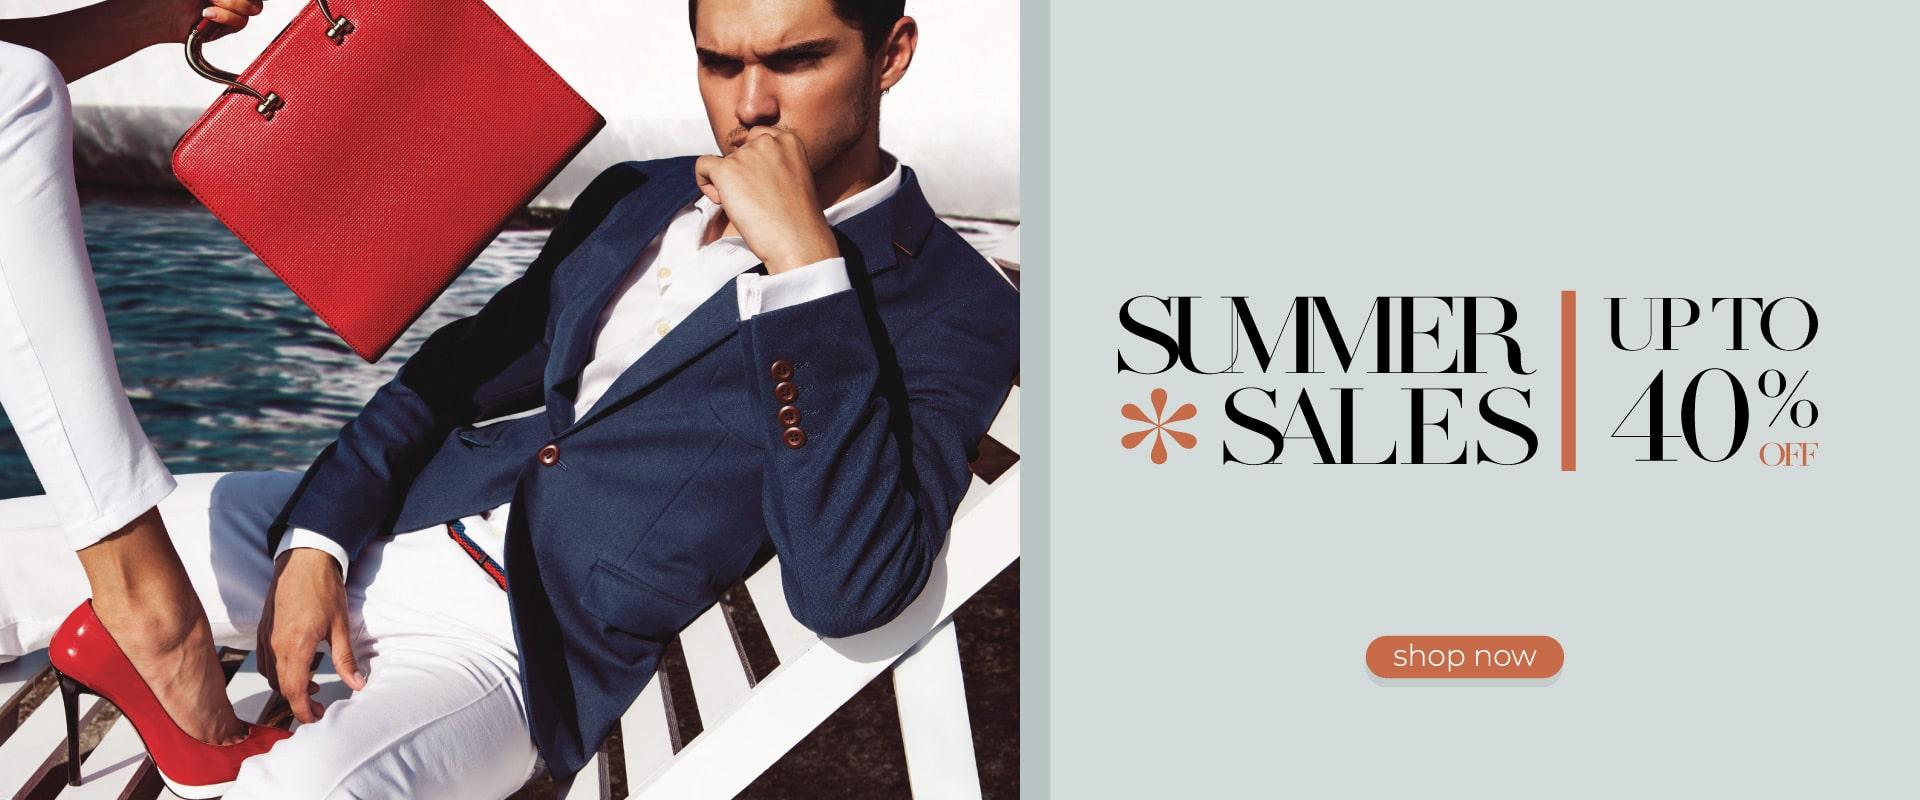 summer sales image